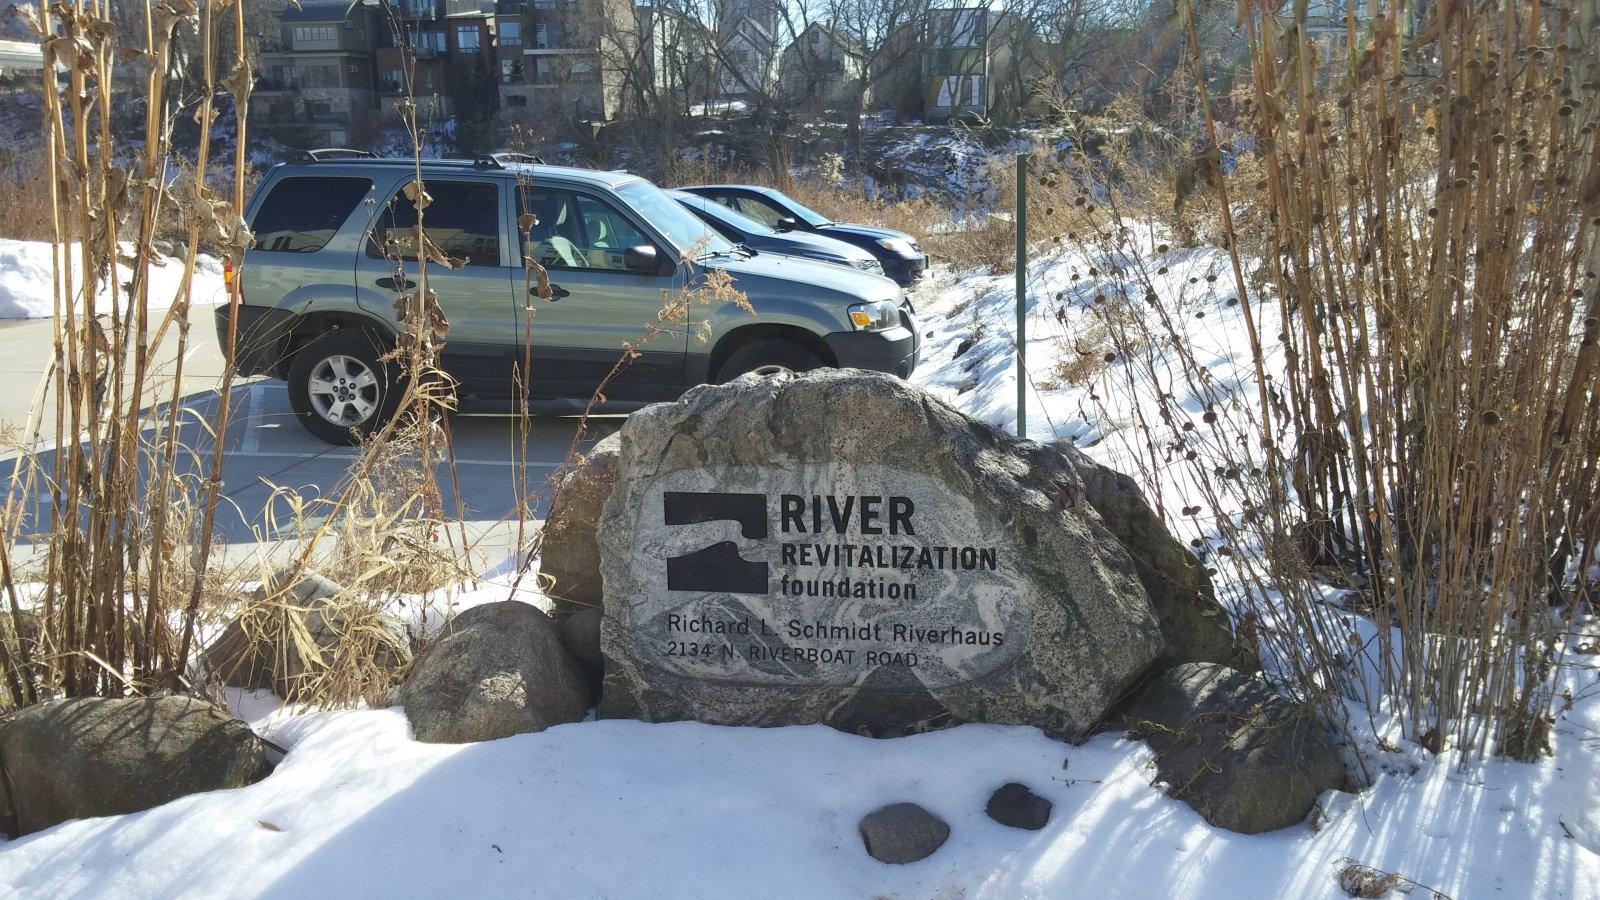 River Revitalization Foundation marker